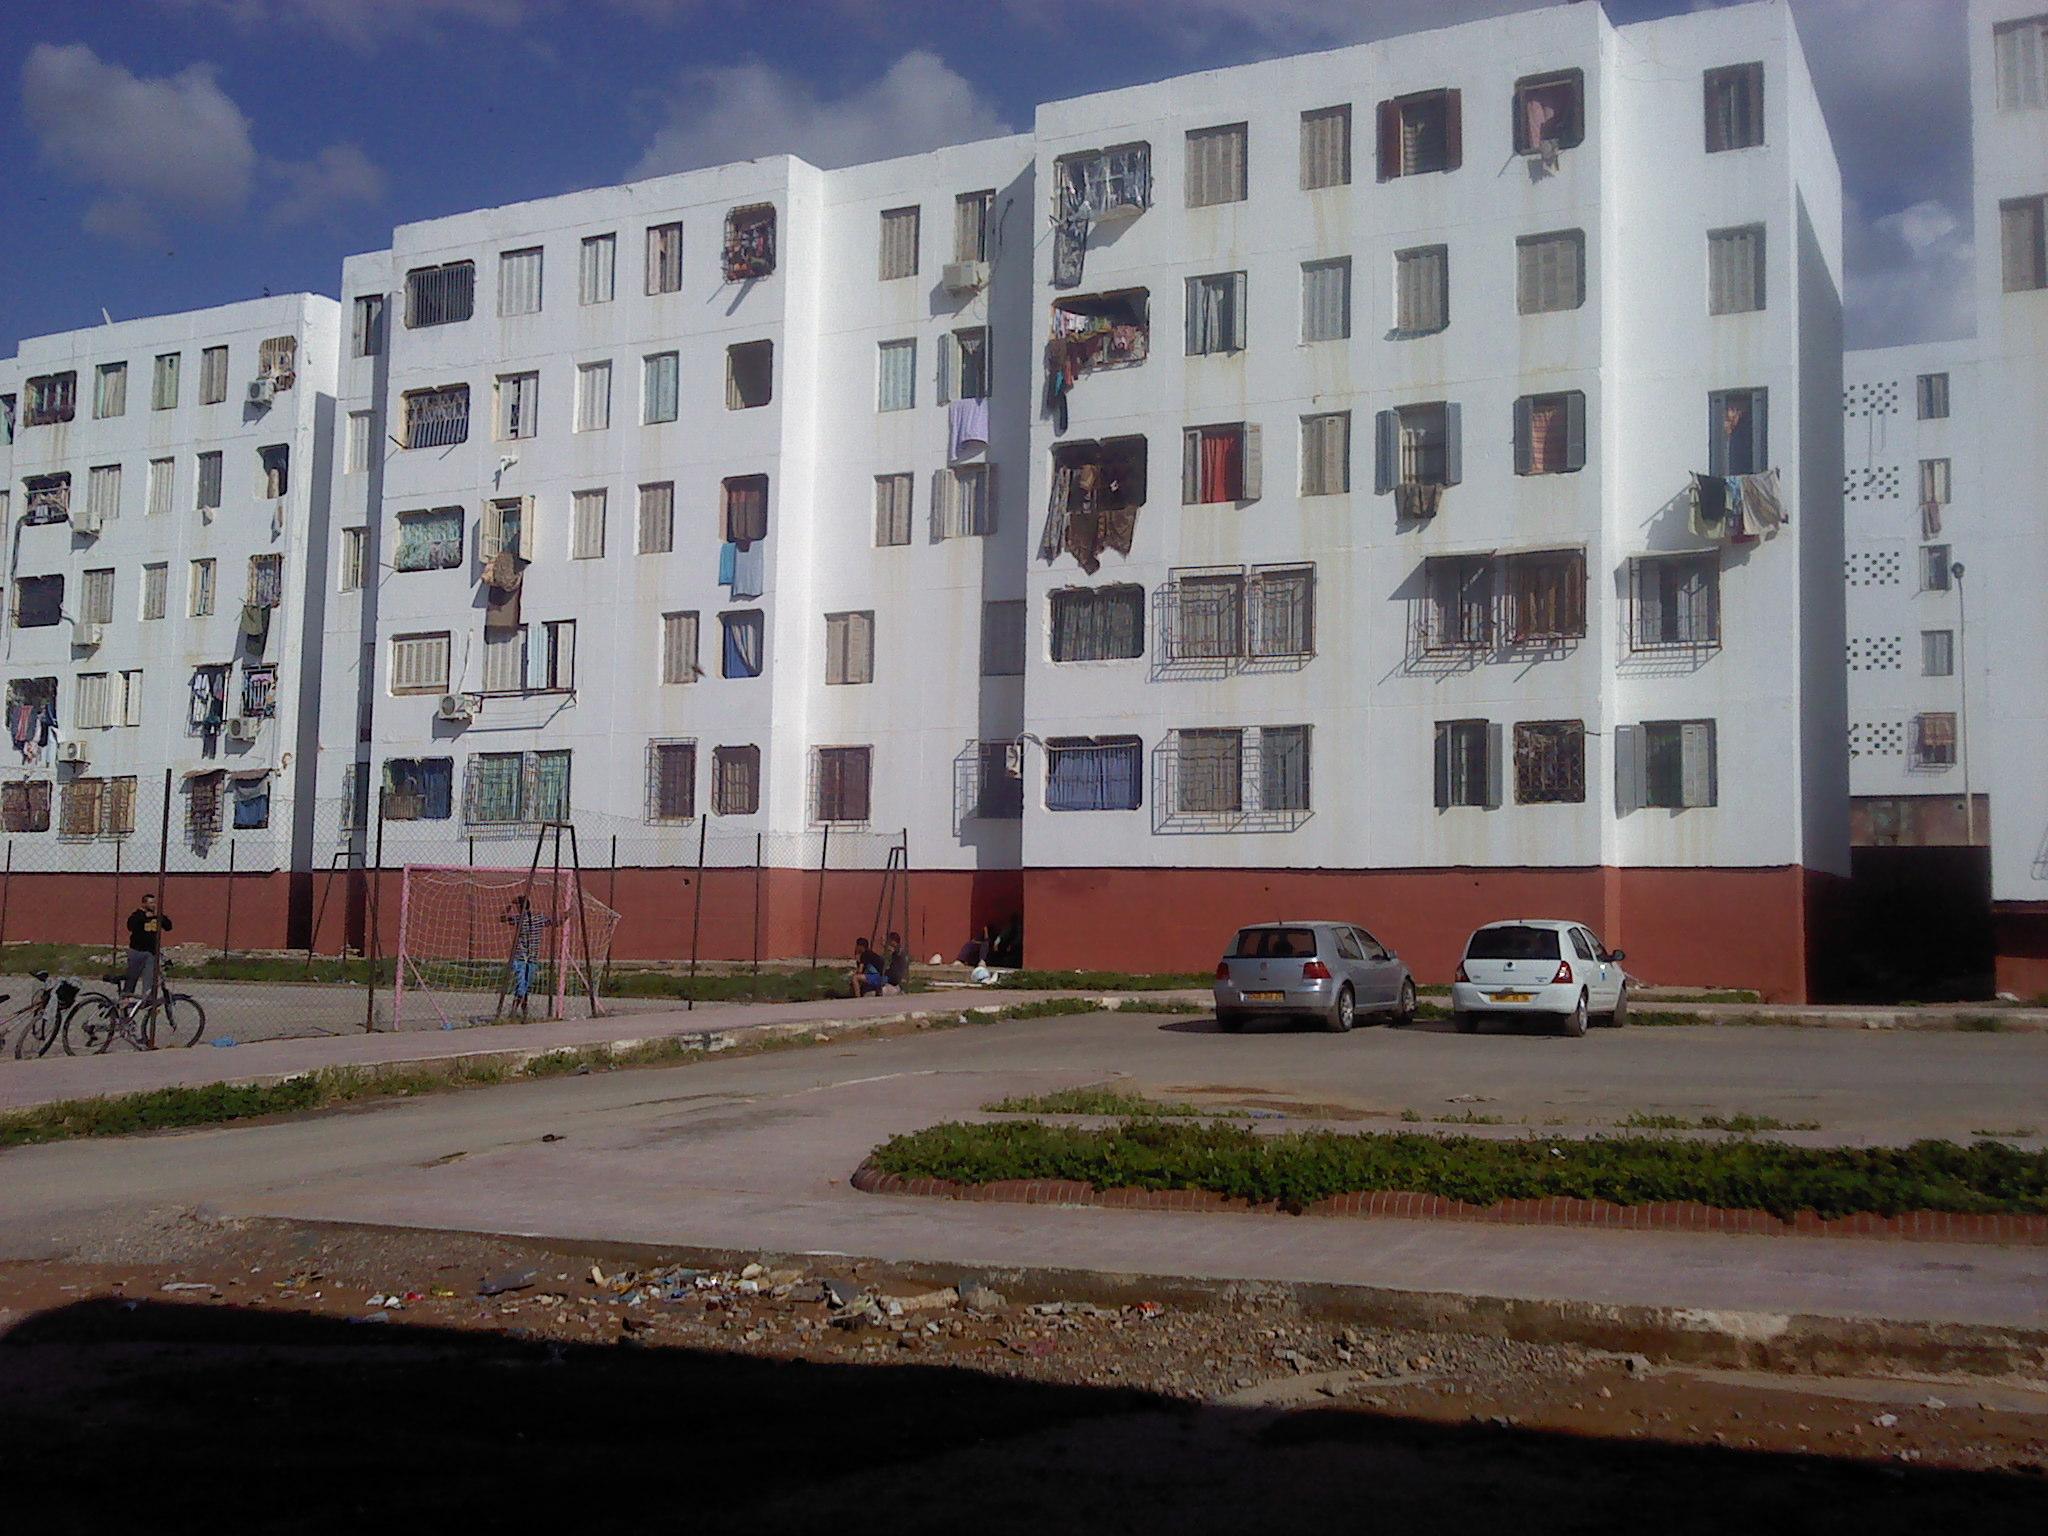 MohammadiaW MascaraAlgérie 500 cité LogementsEl jpg Fichier fgyb76